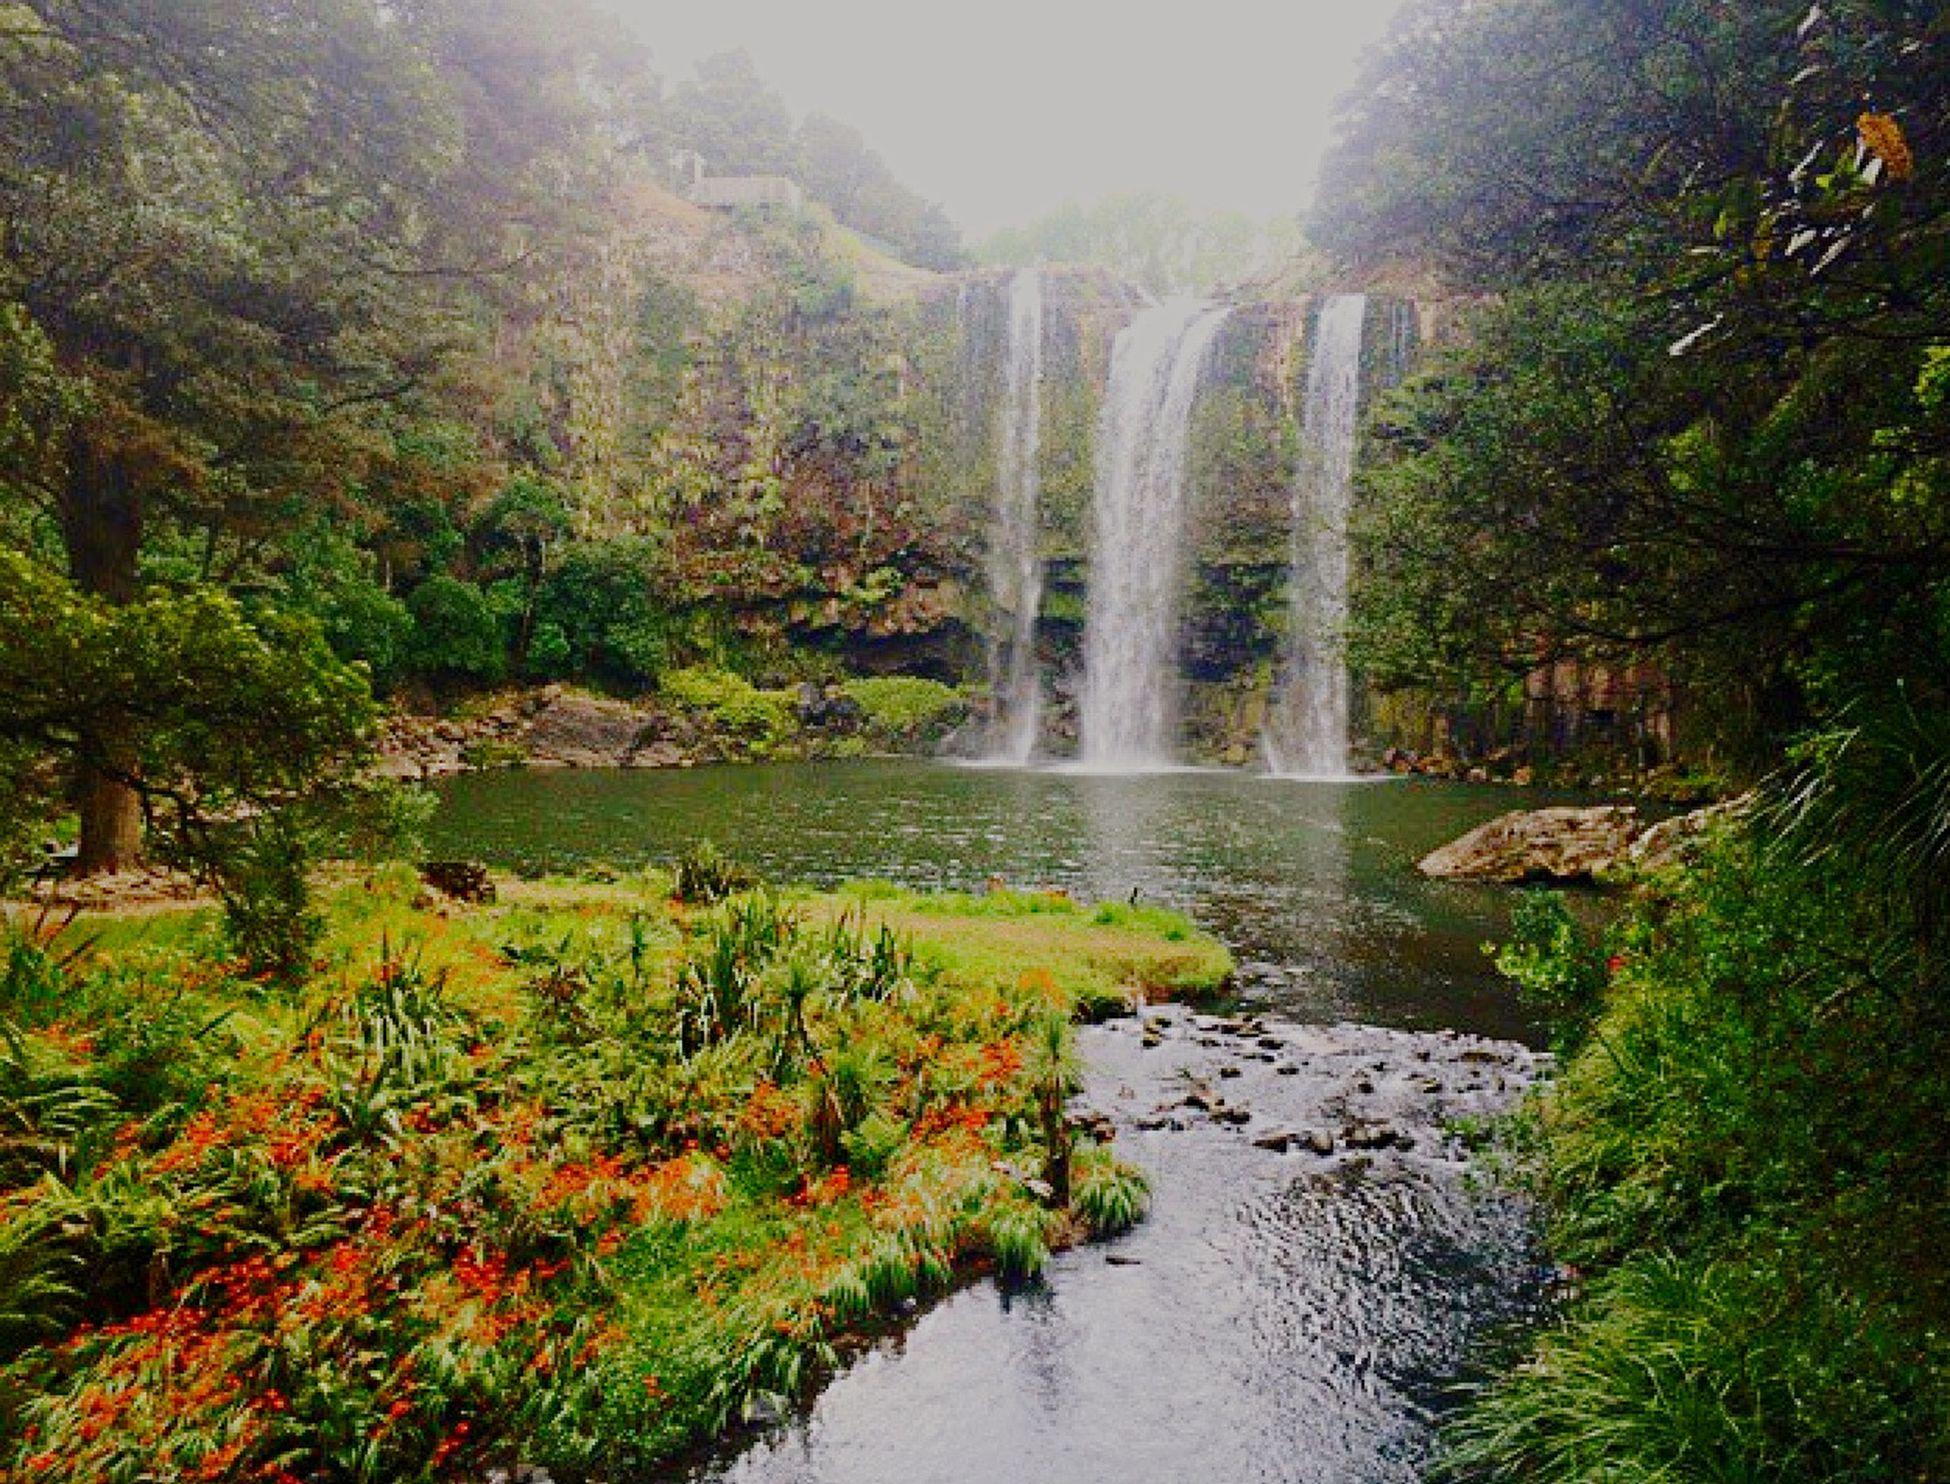 whangarei falls 😍